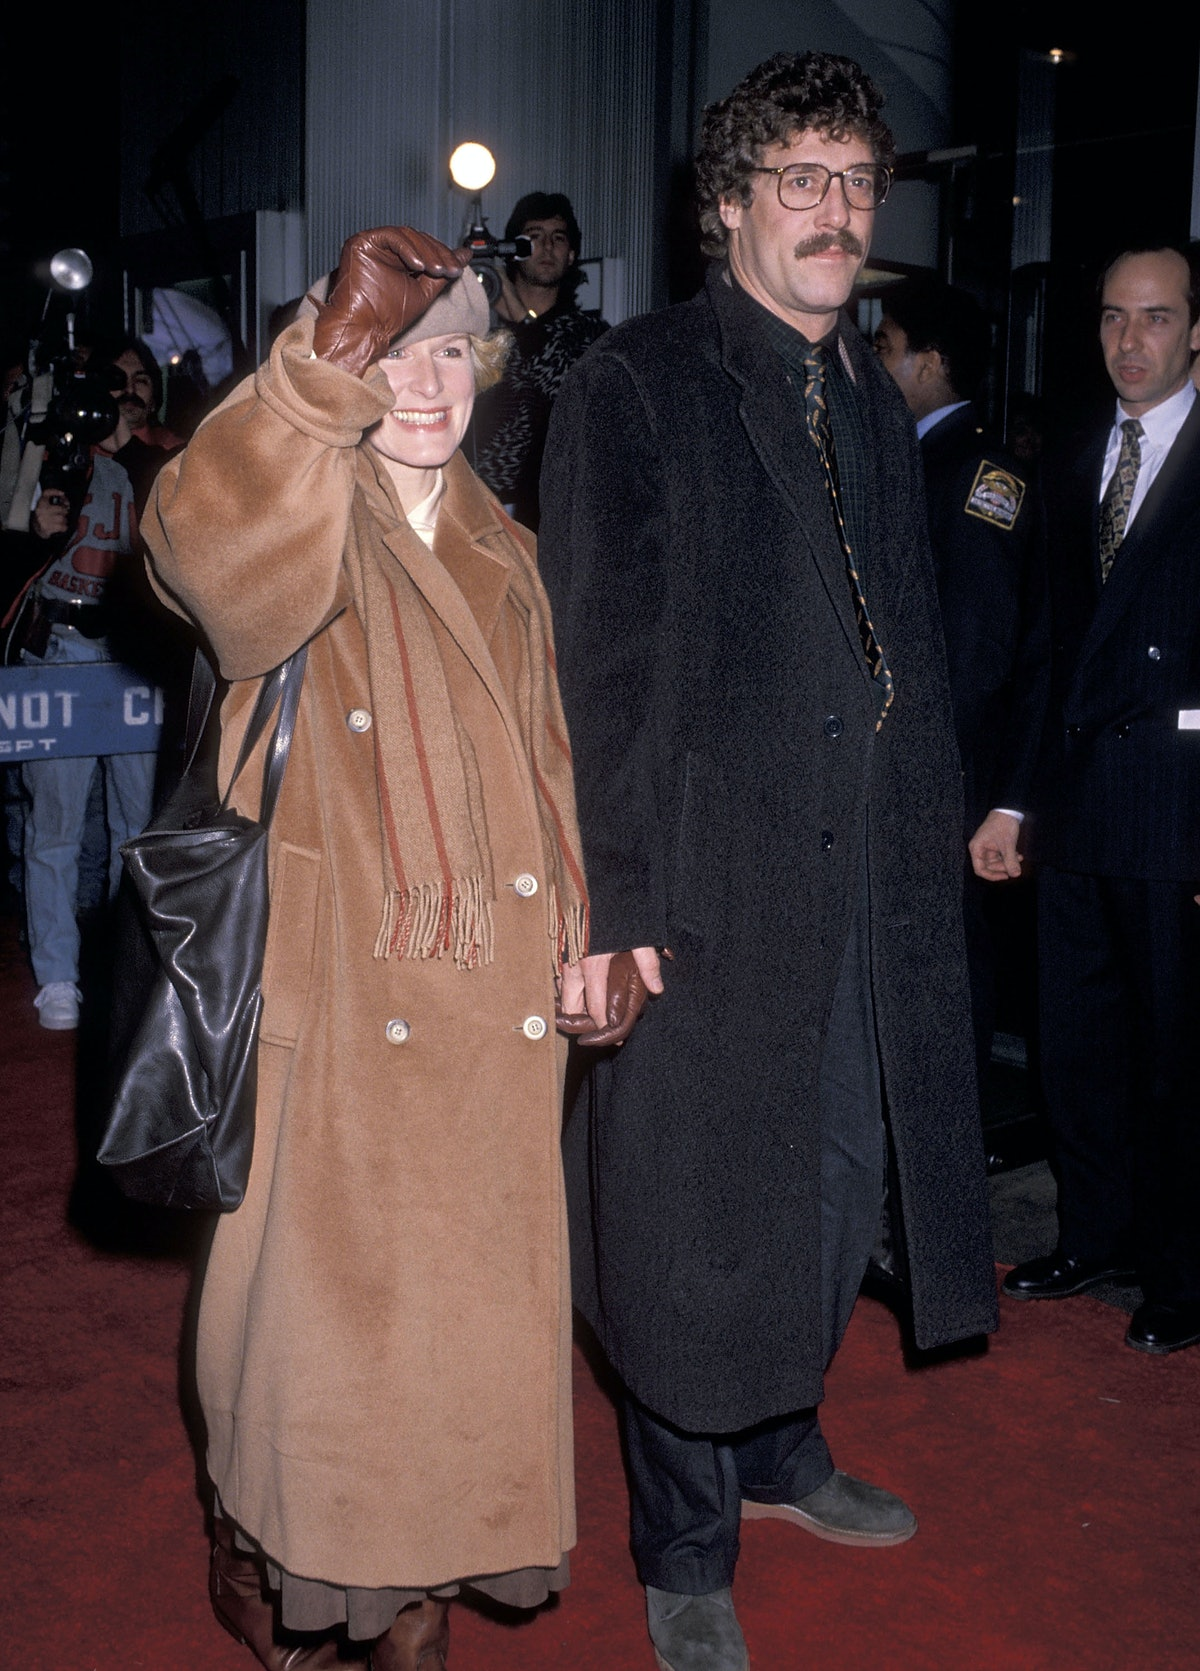 Glenn wearing a brown coat